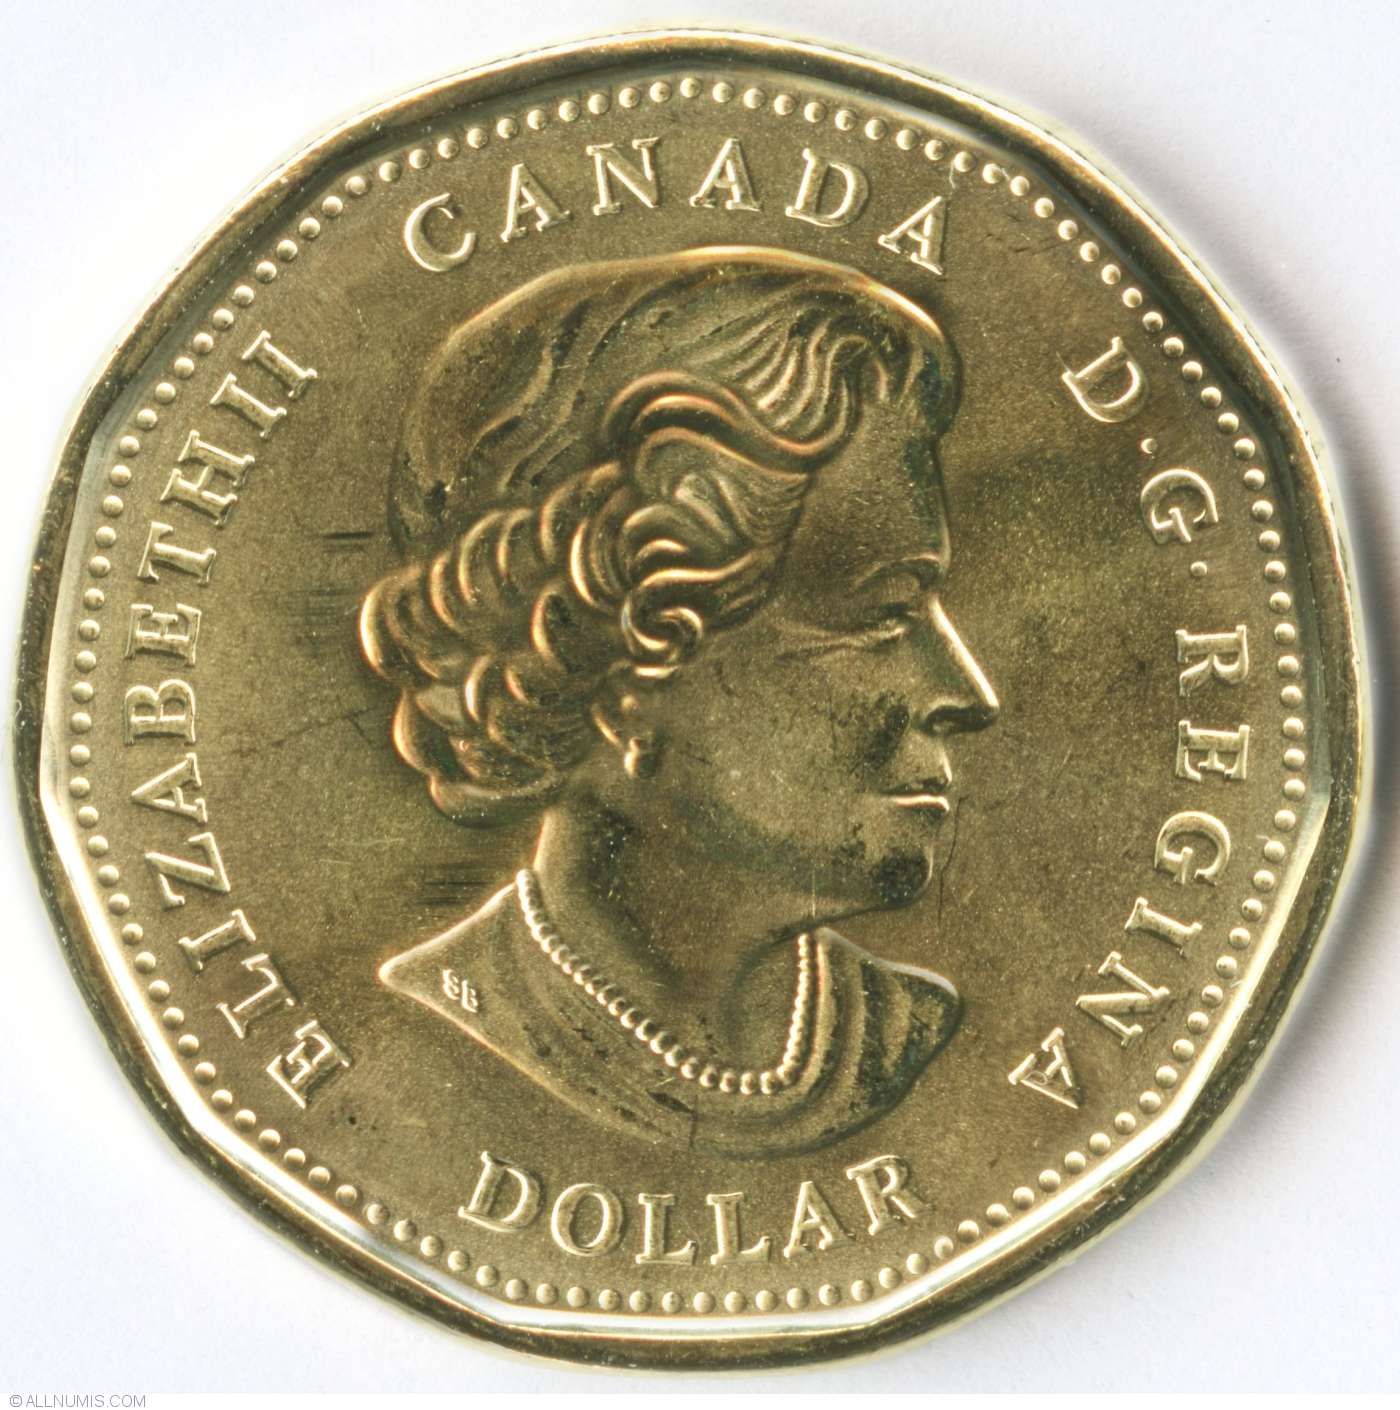 CANADA 2016 WOMEN/'S RIGHT TO VOTE 100TH ANNIVERSARY DOLLAR COIN